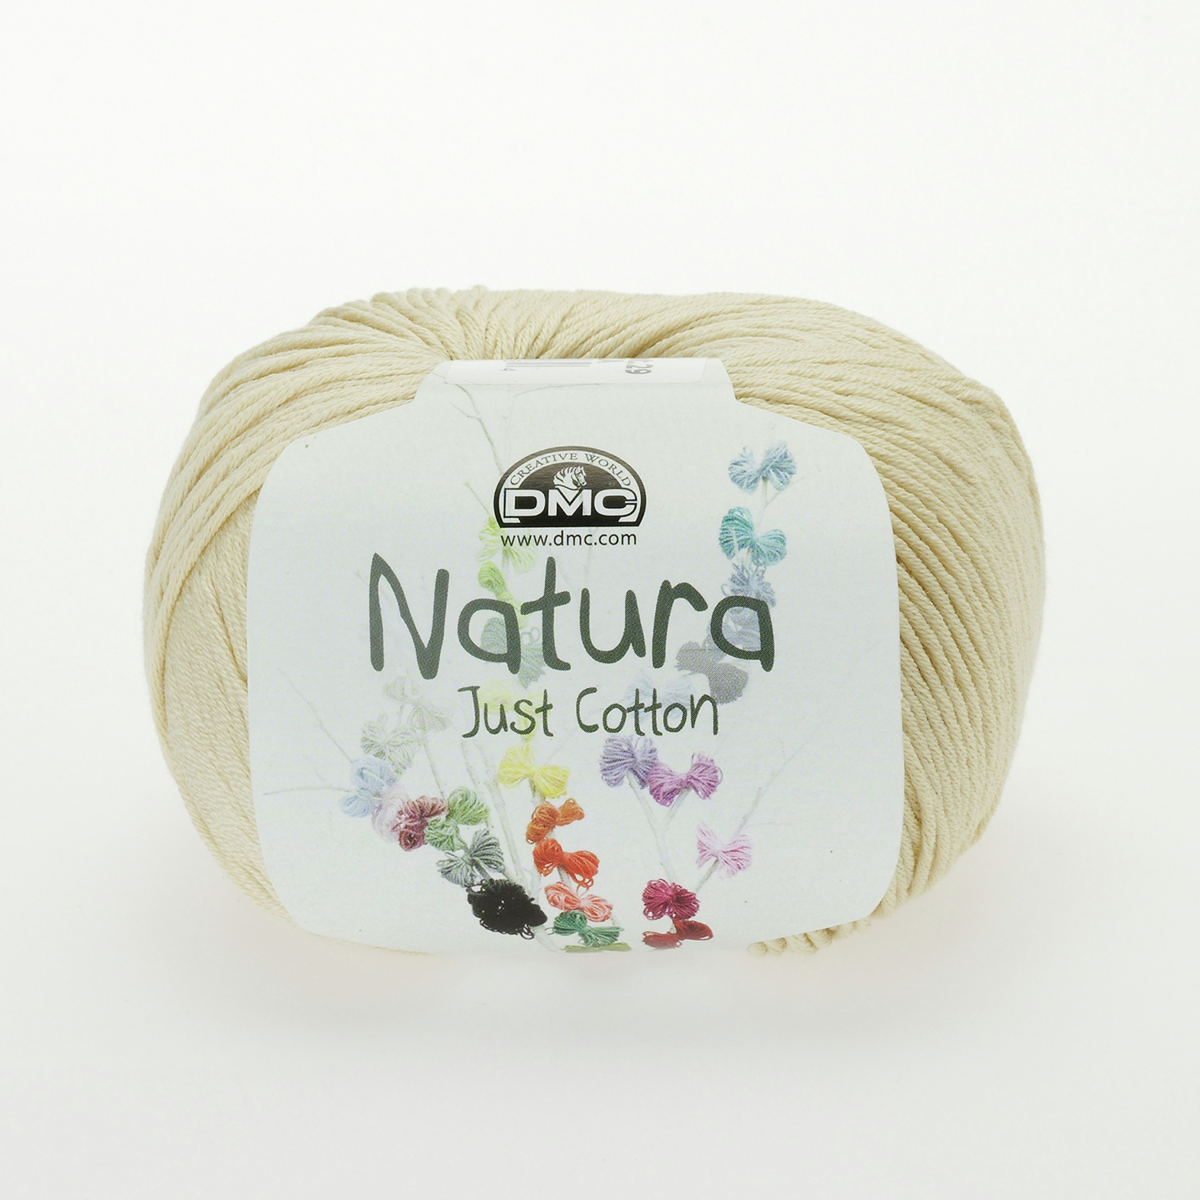 DMC Natura Just Cotton Wool - N36 Gardenia - Beige Cream